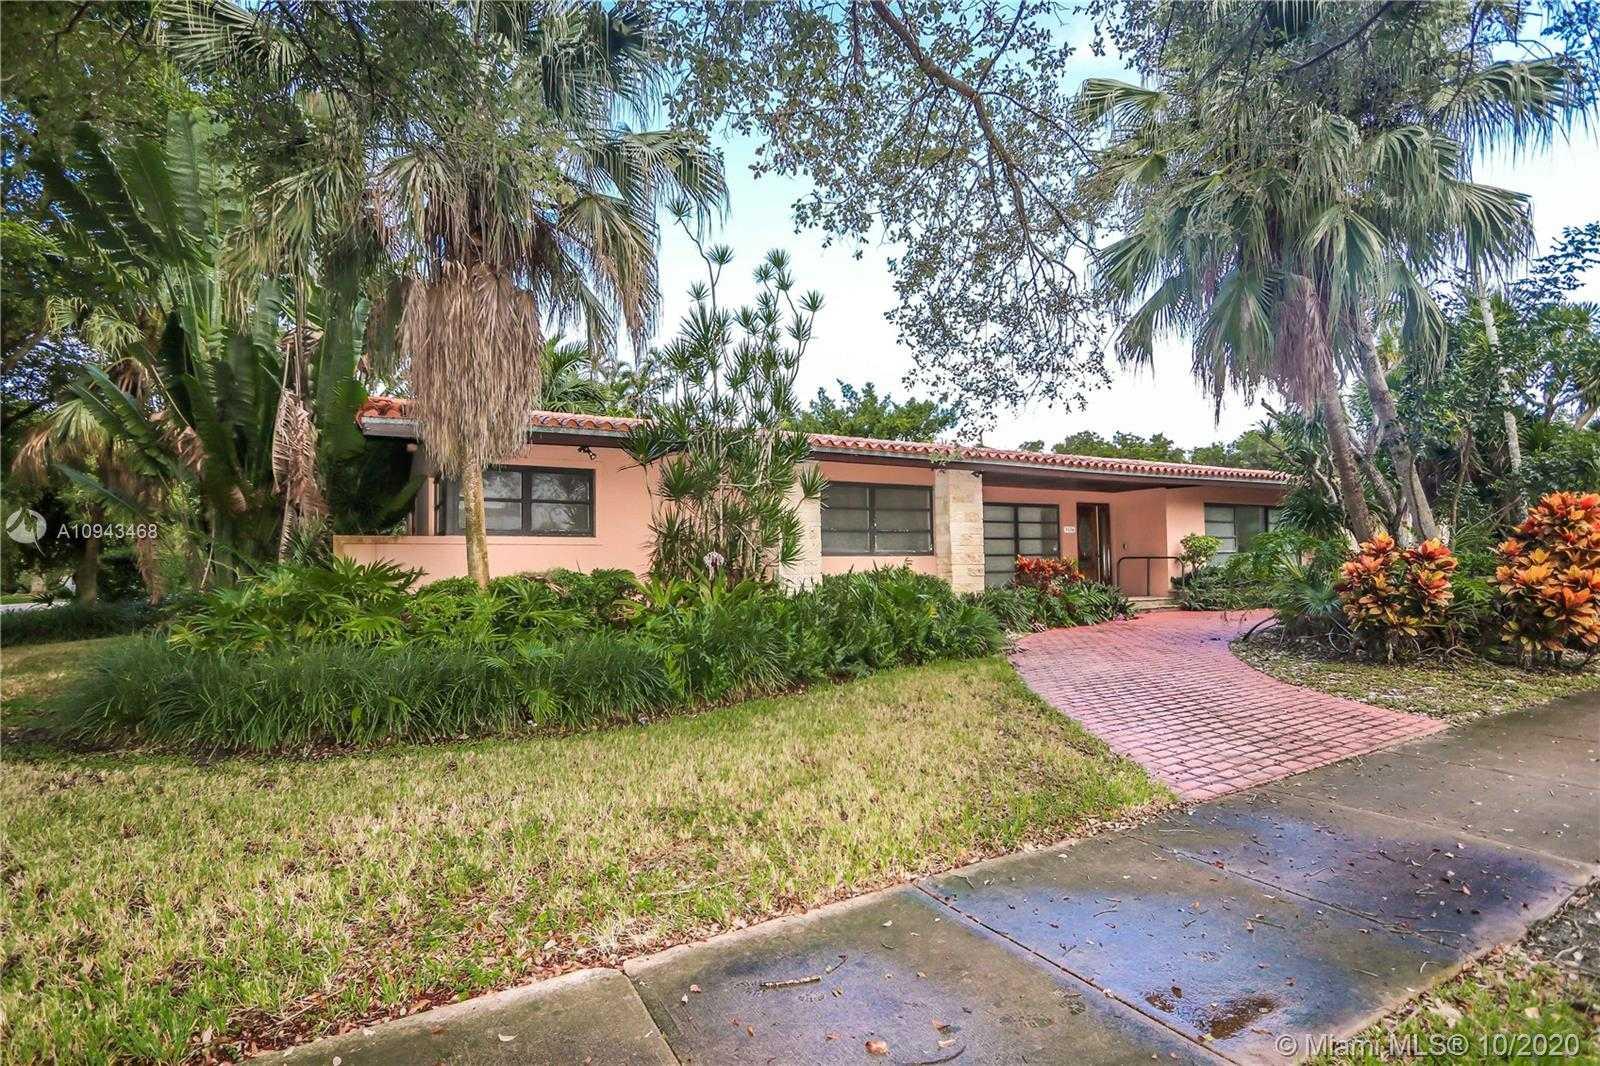 $1,600,000 - 3Br/2Ba -  for Sale in C Gab Riviera Sec 10, Coral Gables